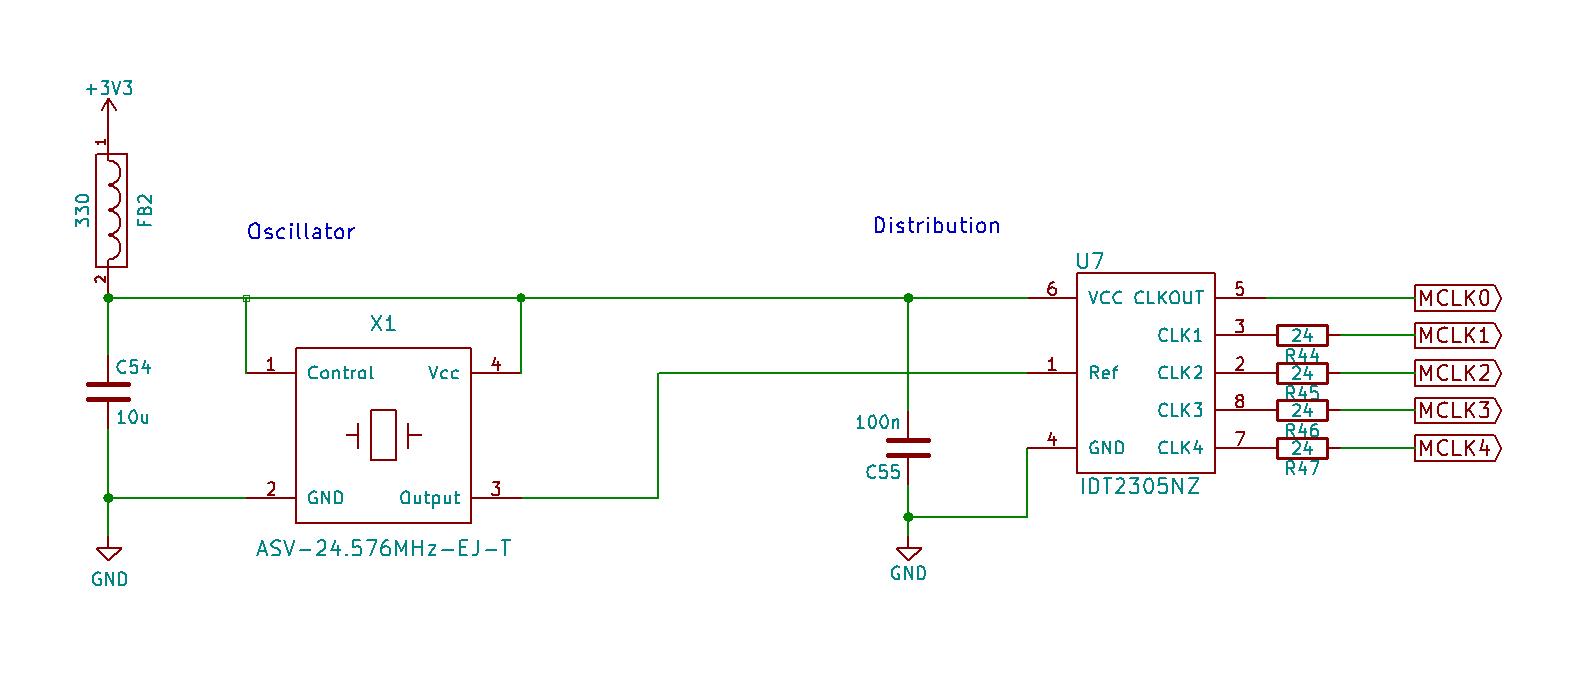 Clock Repeater IC, Jitter correction ic, clock distibution-freedsp-classic-smd-master-clock-png